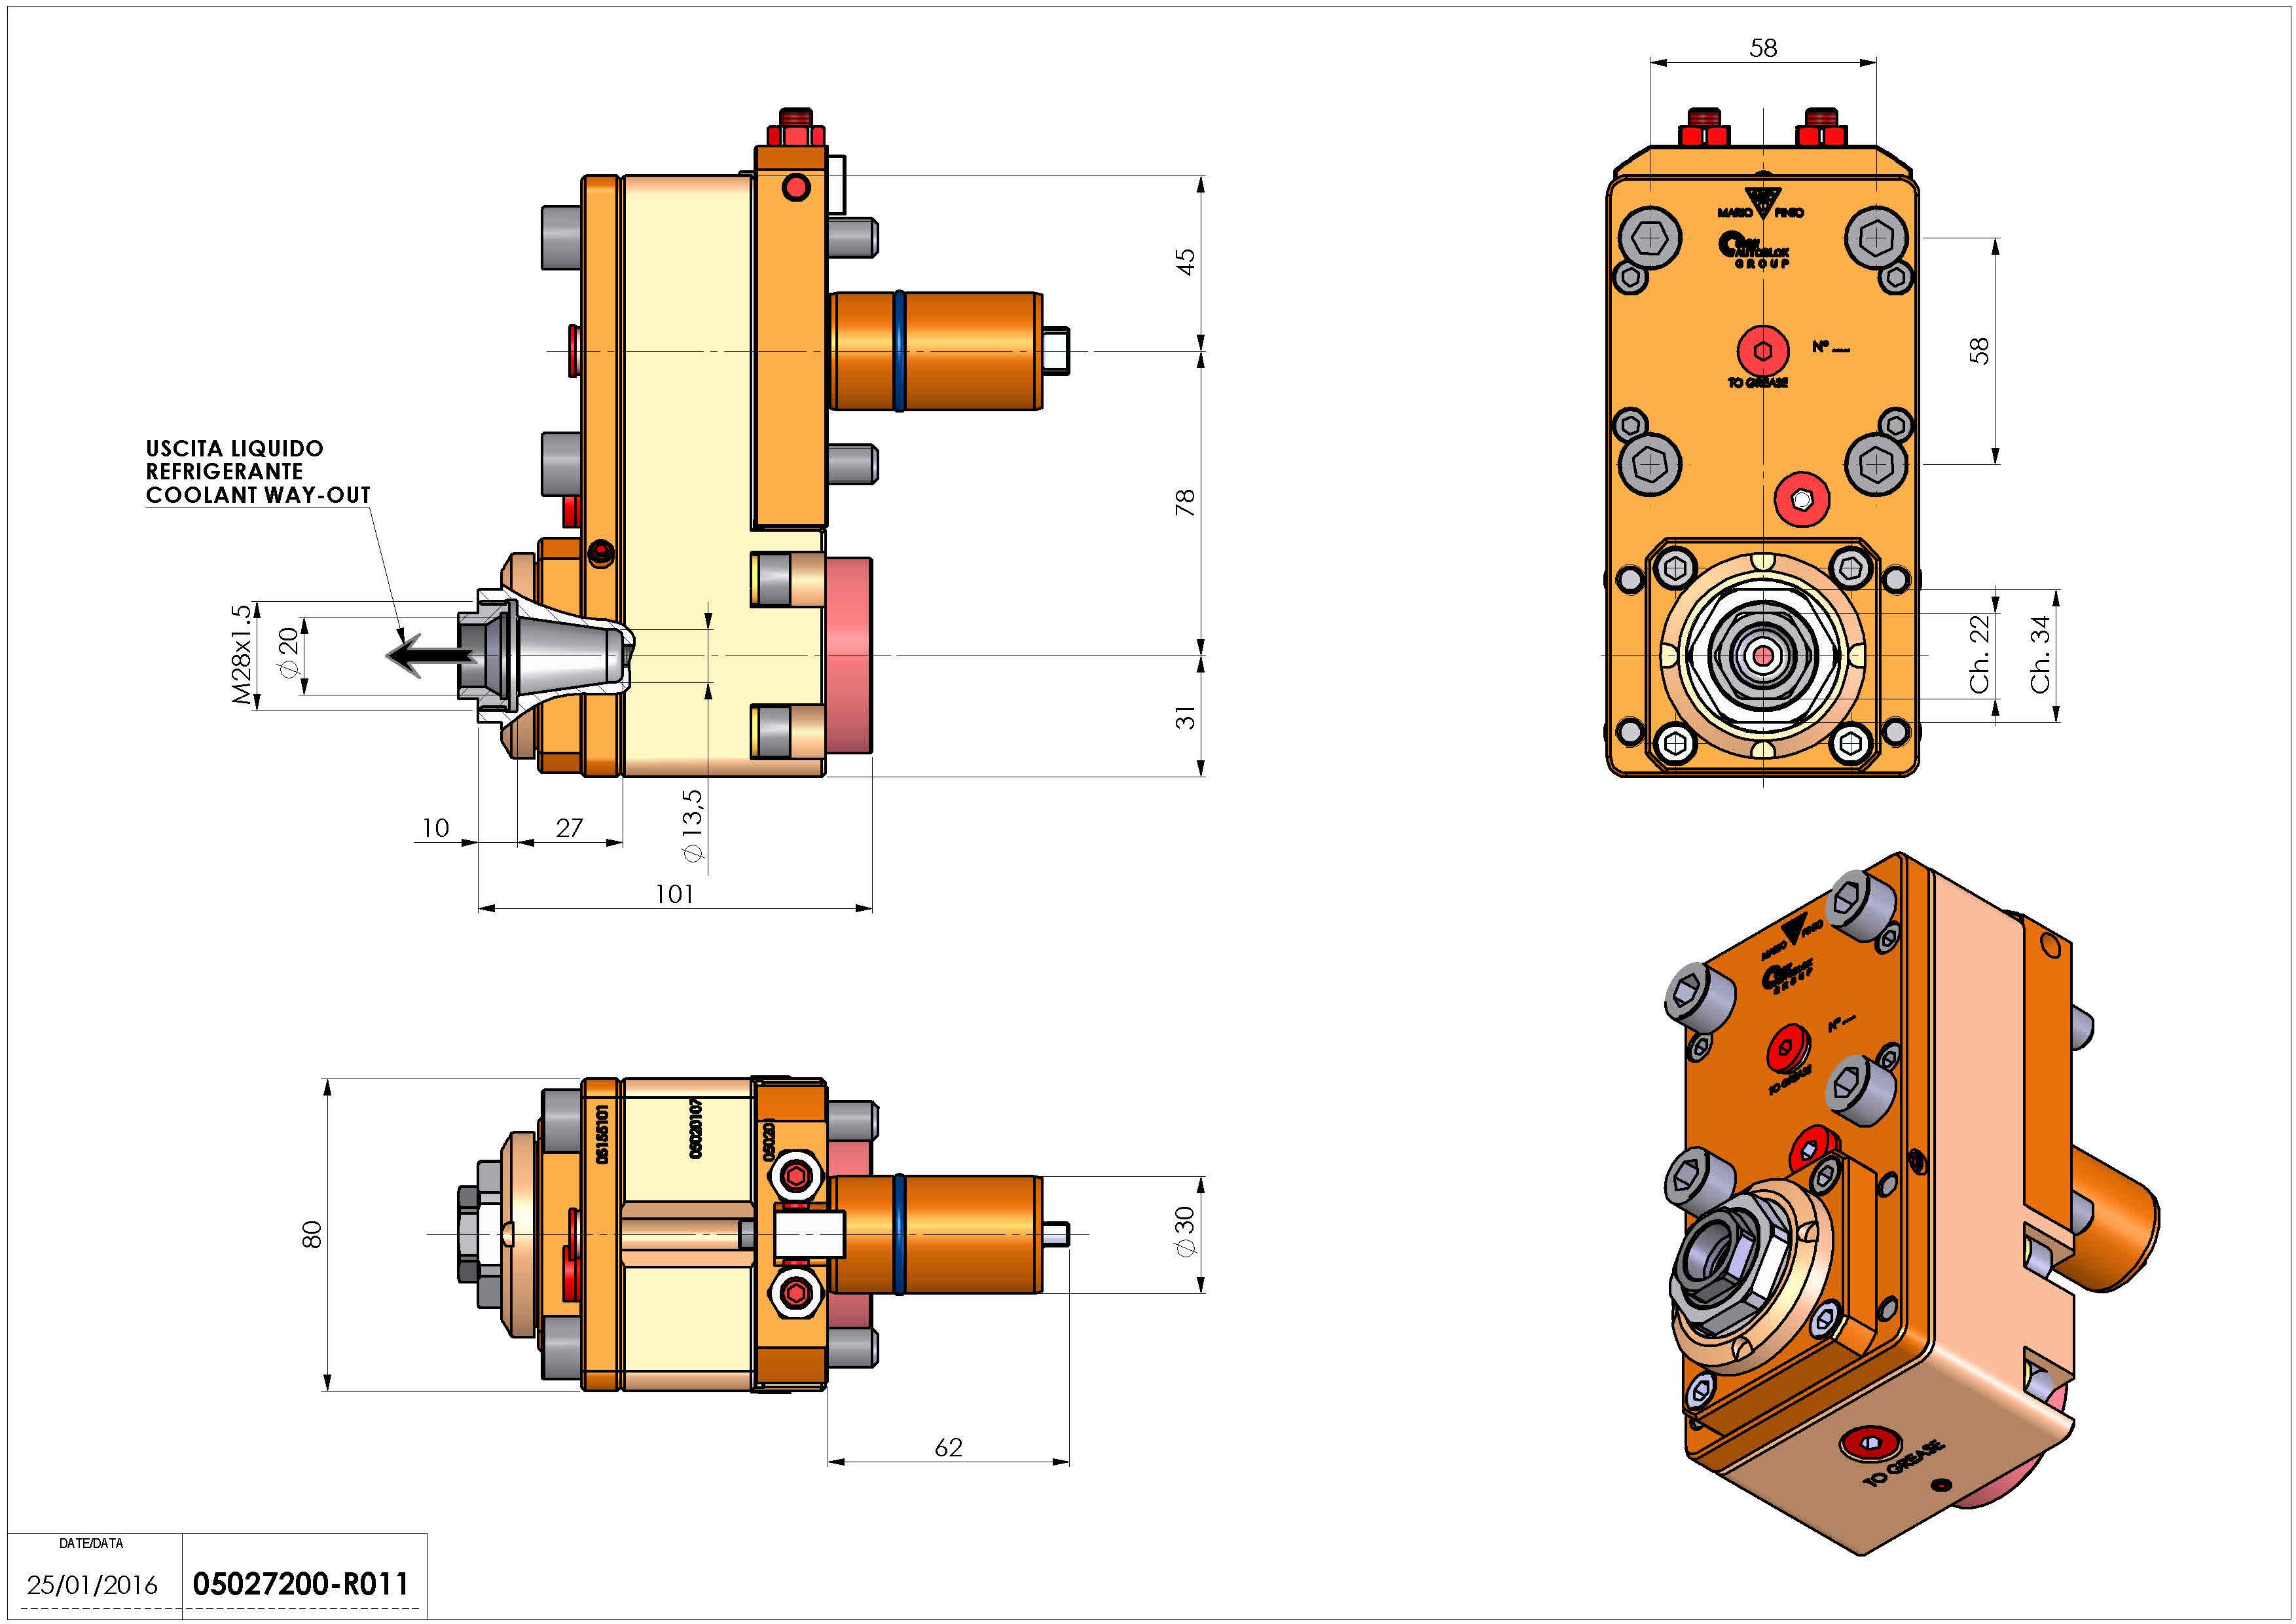 Technical image - LTS D30 ER20F OFS78 RF1:3H88TZ.